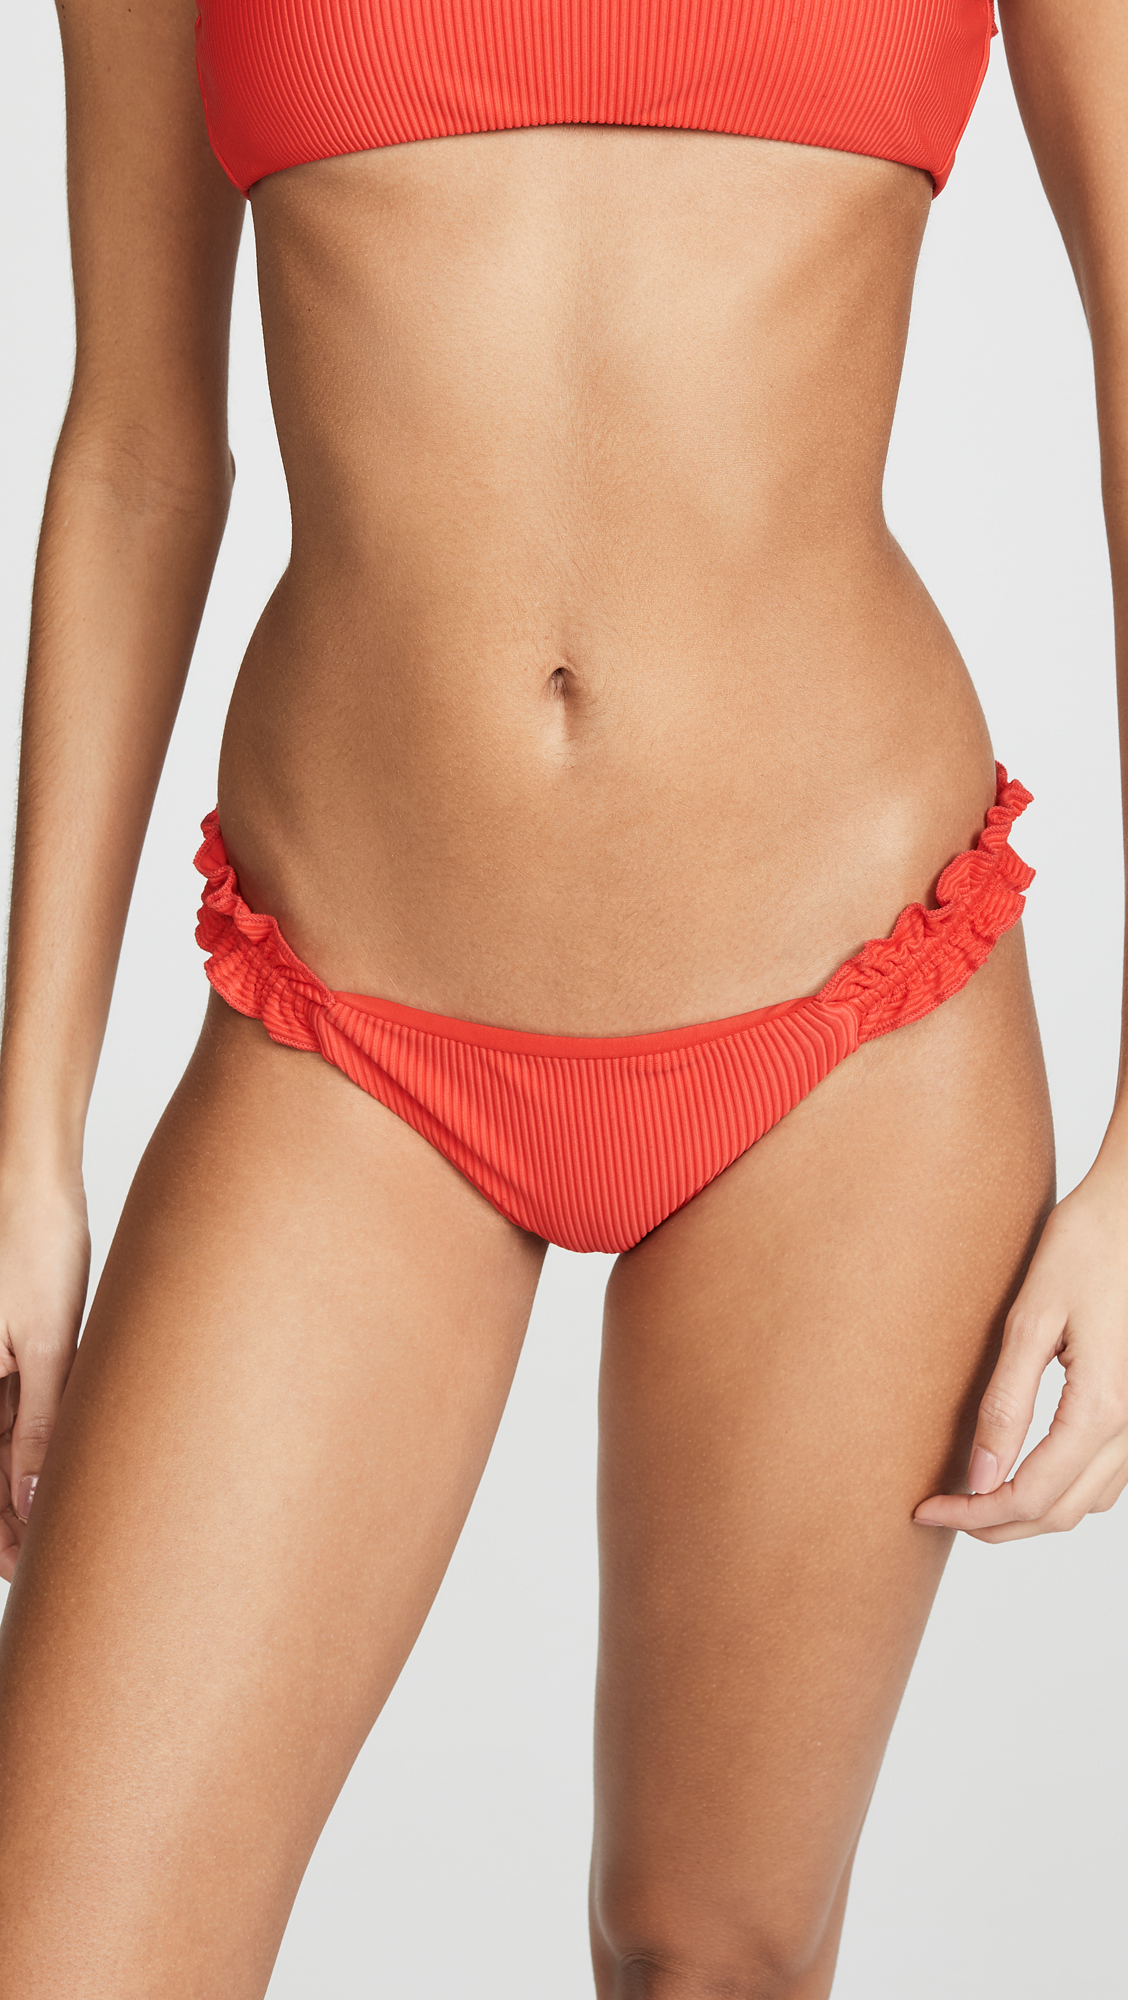 Ellejay Ipanema Bikini Bottoms